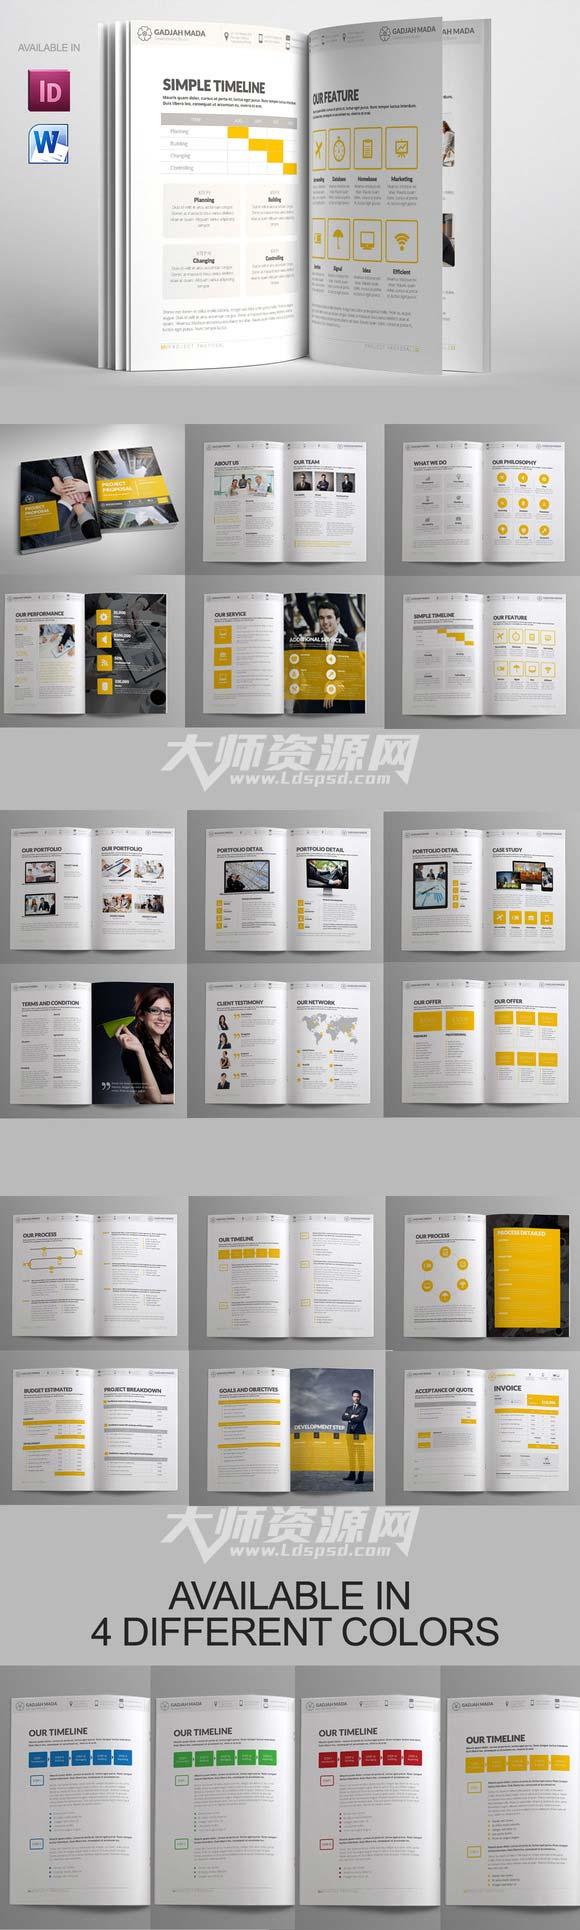 indesign模板-商业杂志画册模板:proposal template图片